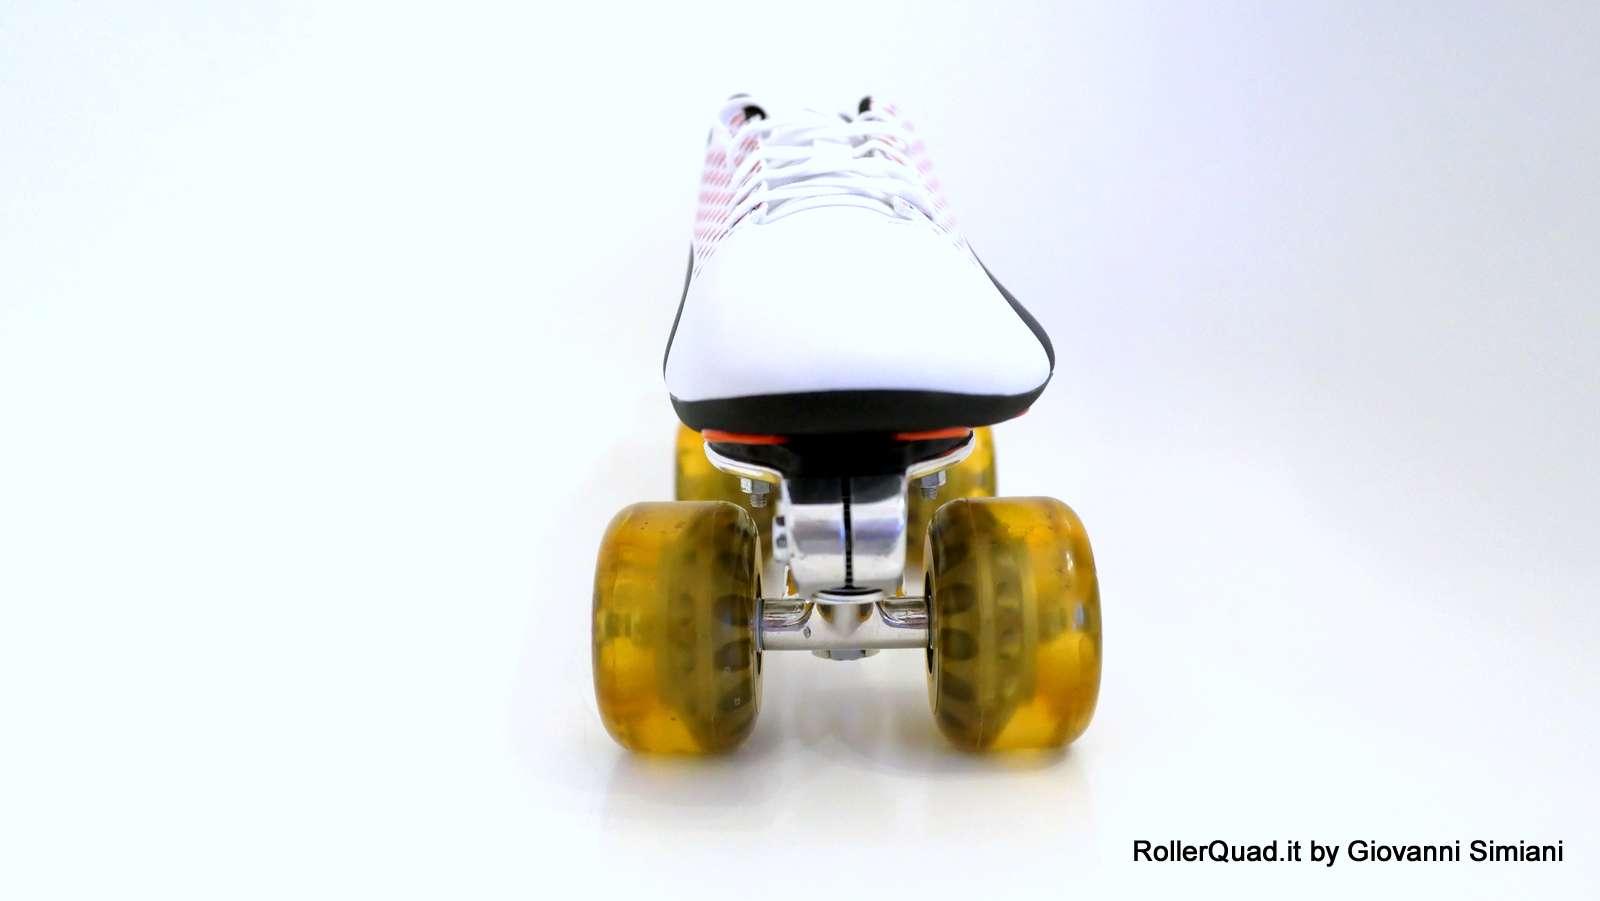 03-rollerquad_it_Giovanni_Simiani